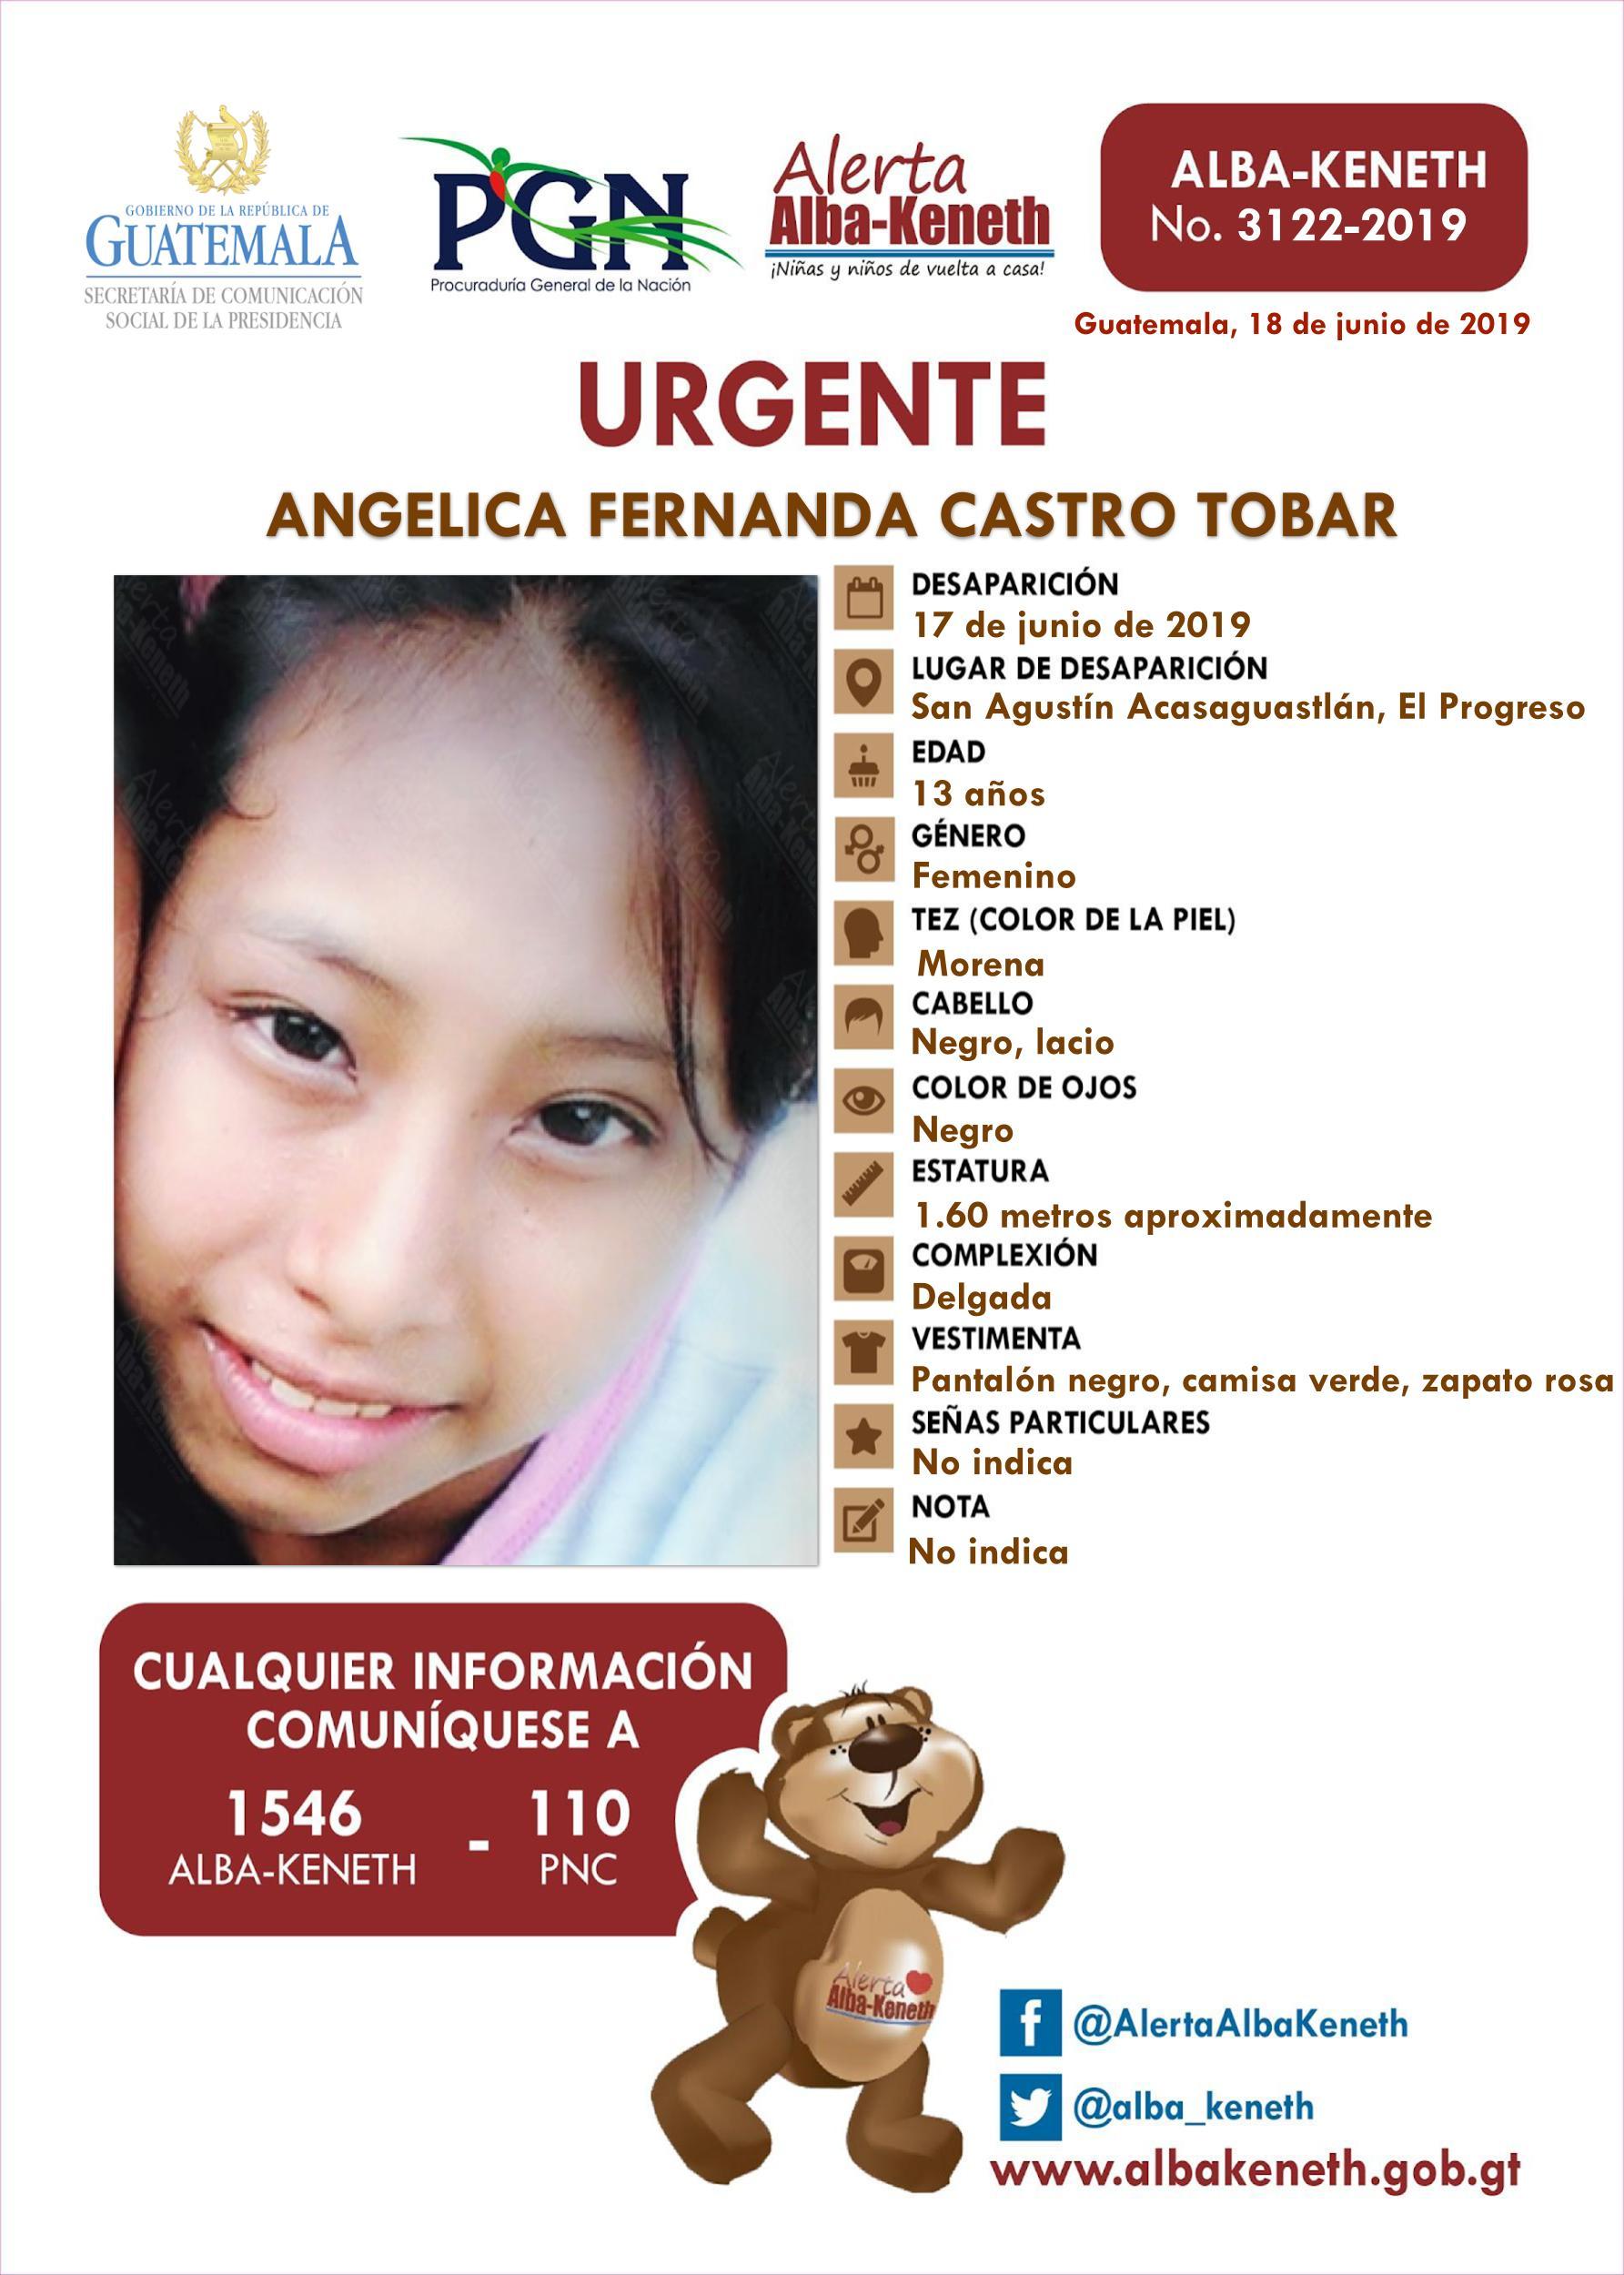 Angelica Fernanda Castro Tobar